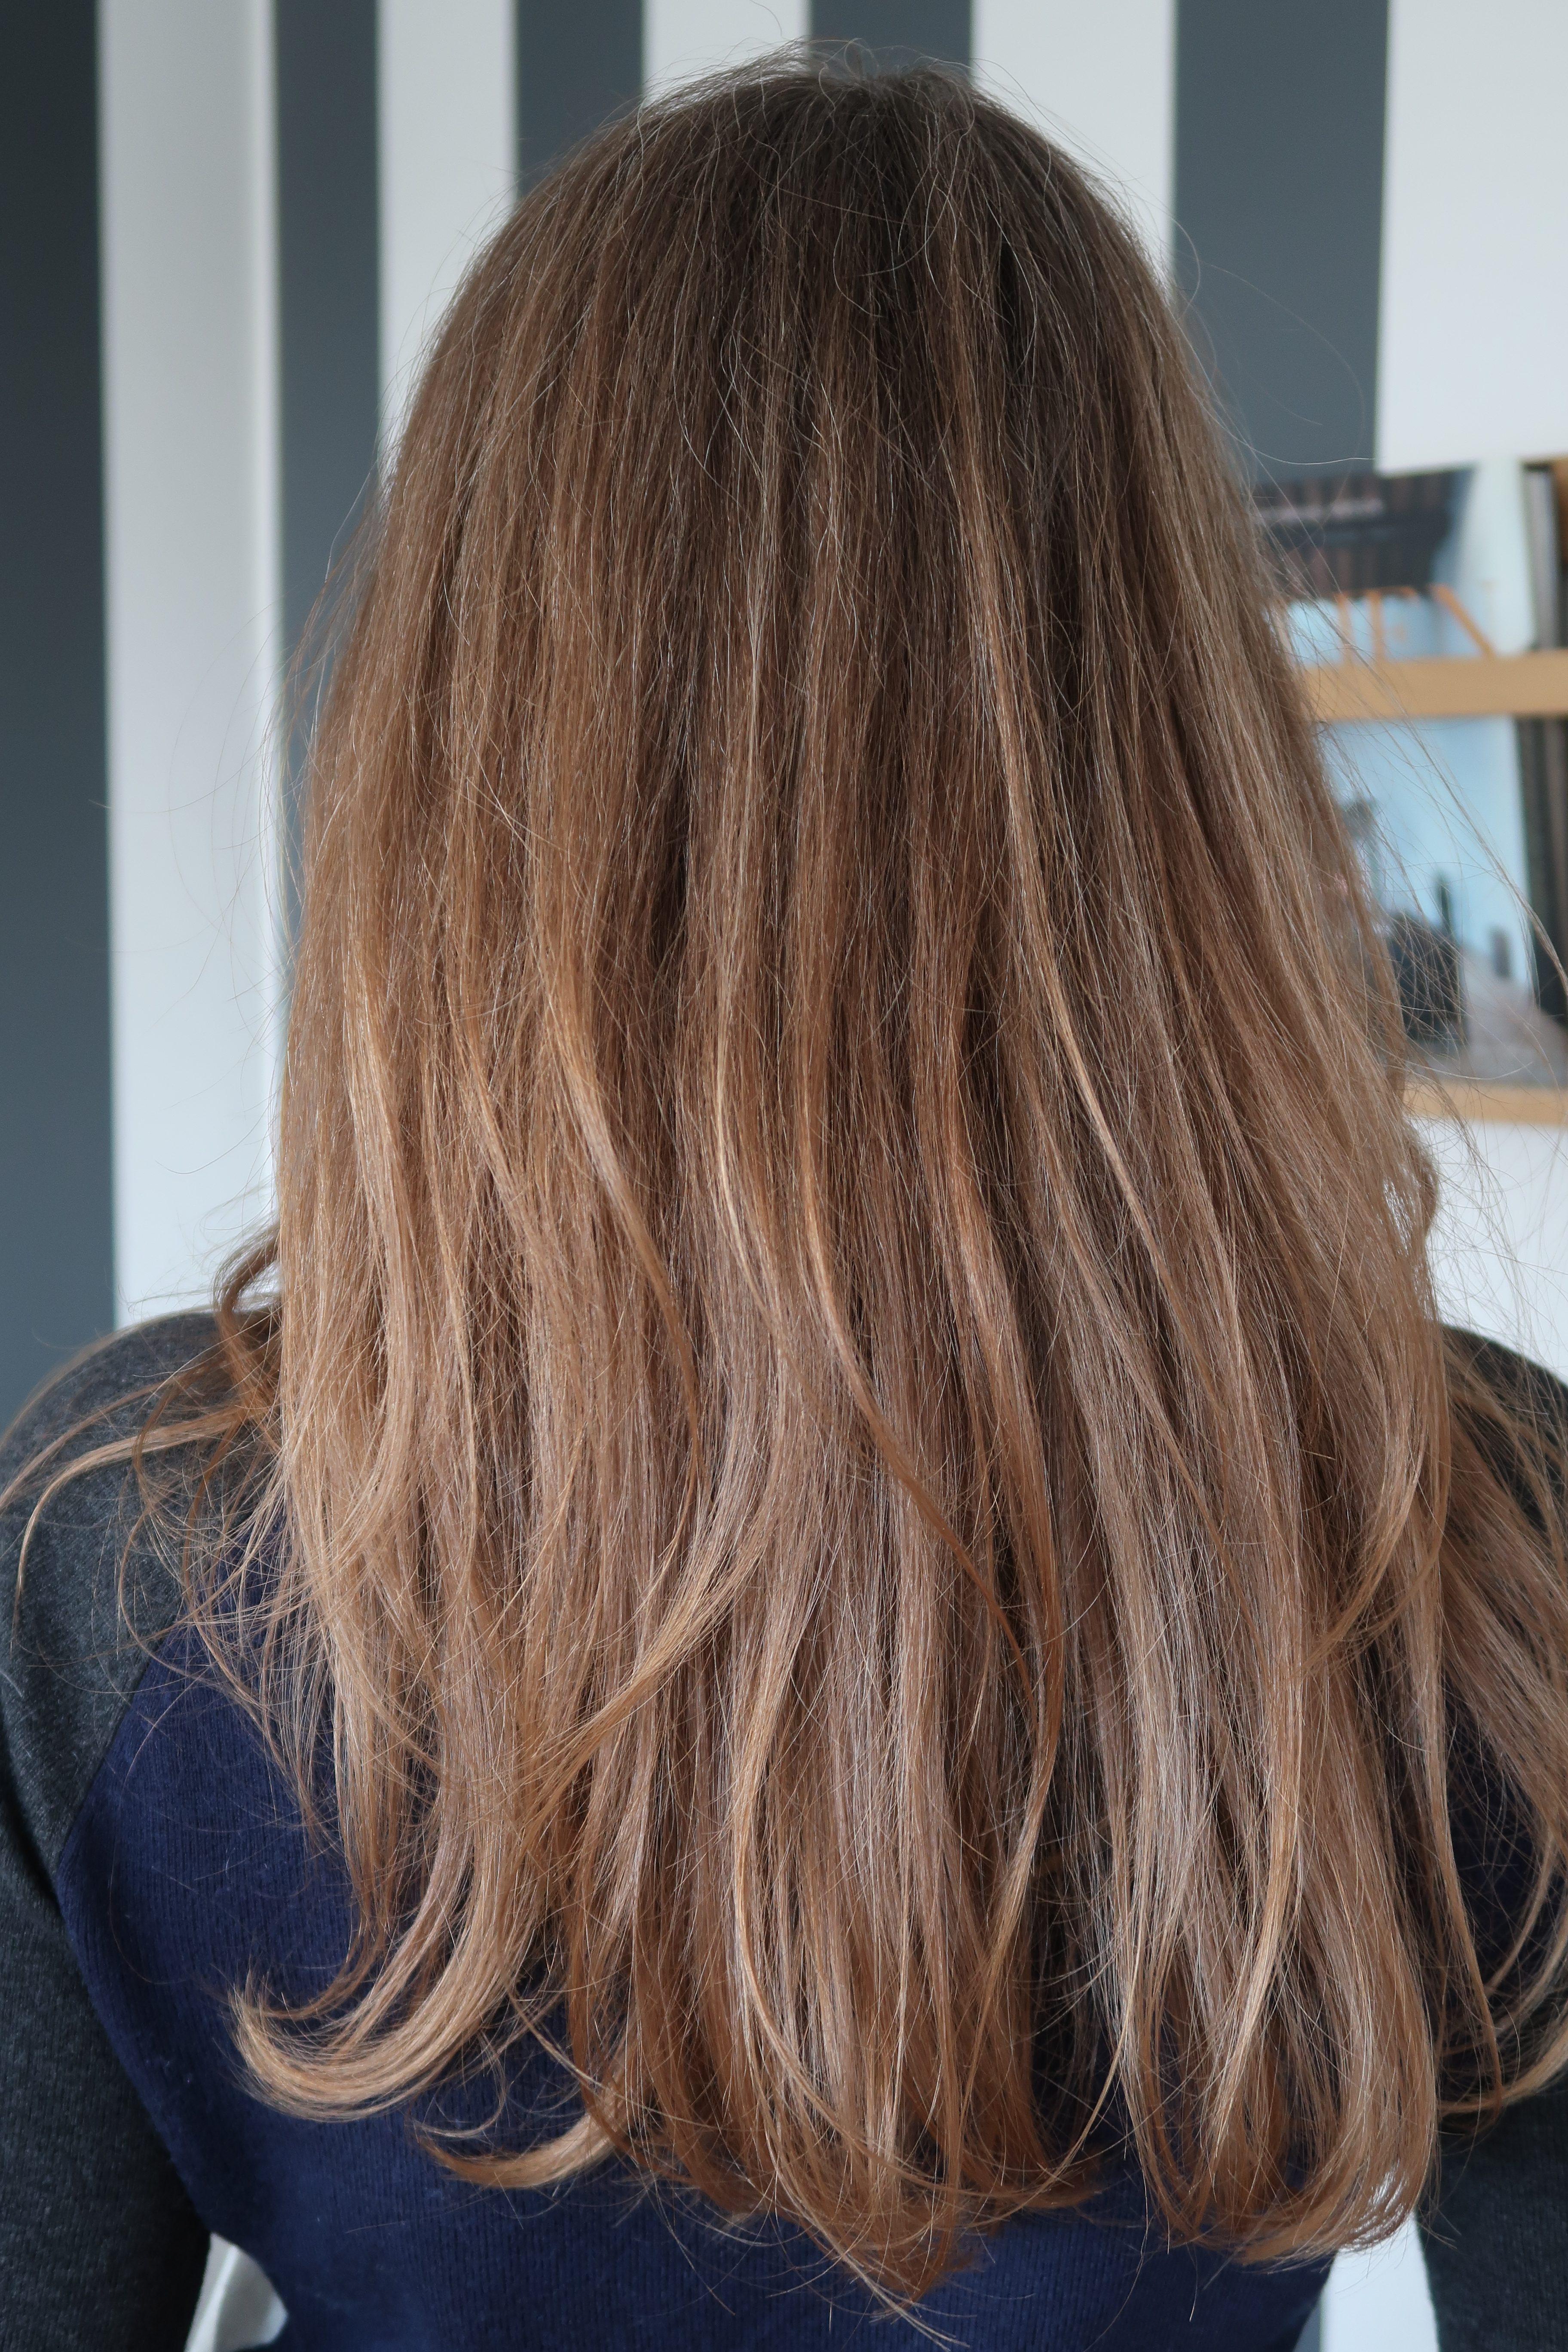 shampoo til brunt hår